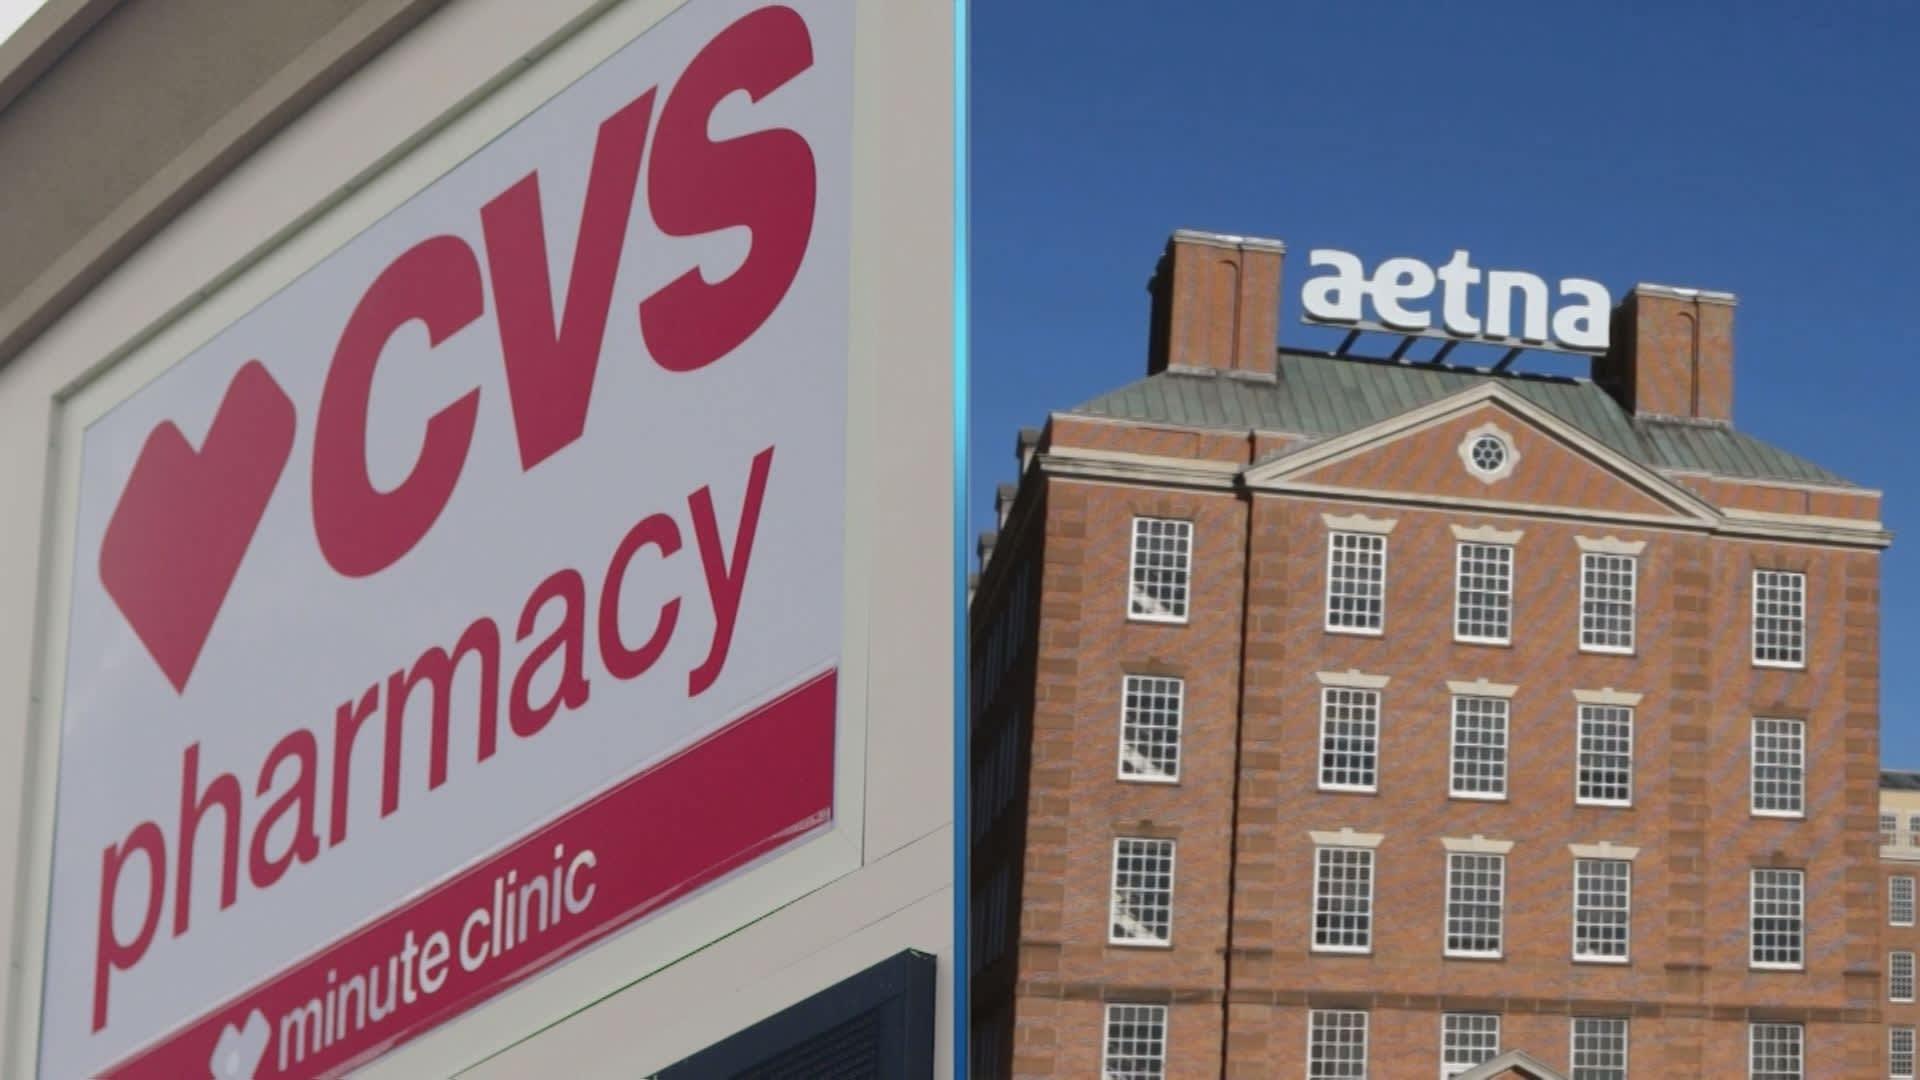 Cvs Aetna Deal To Change How Big Employers Buy Health Benefits